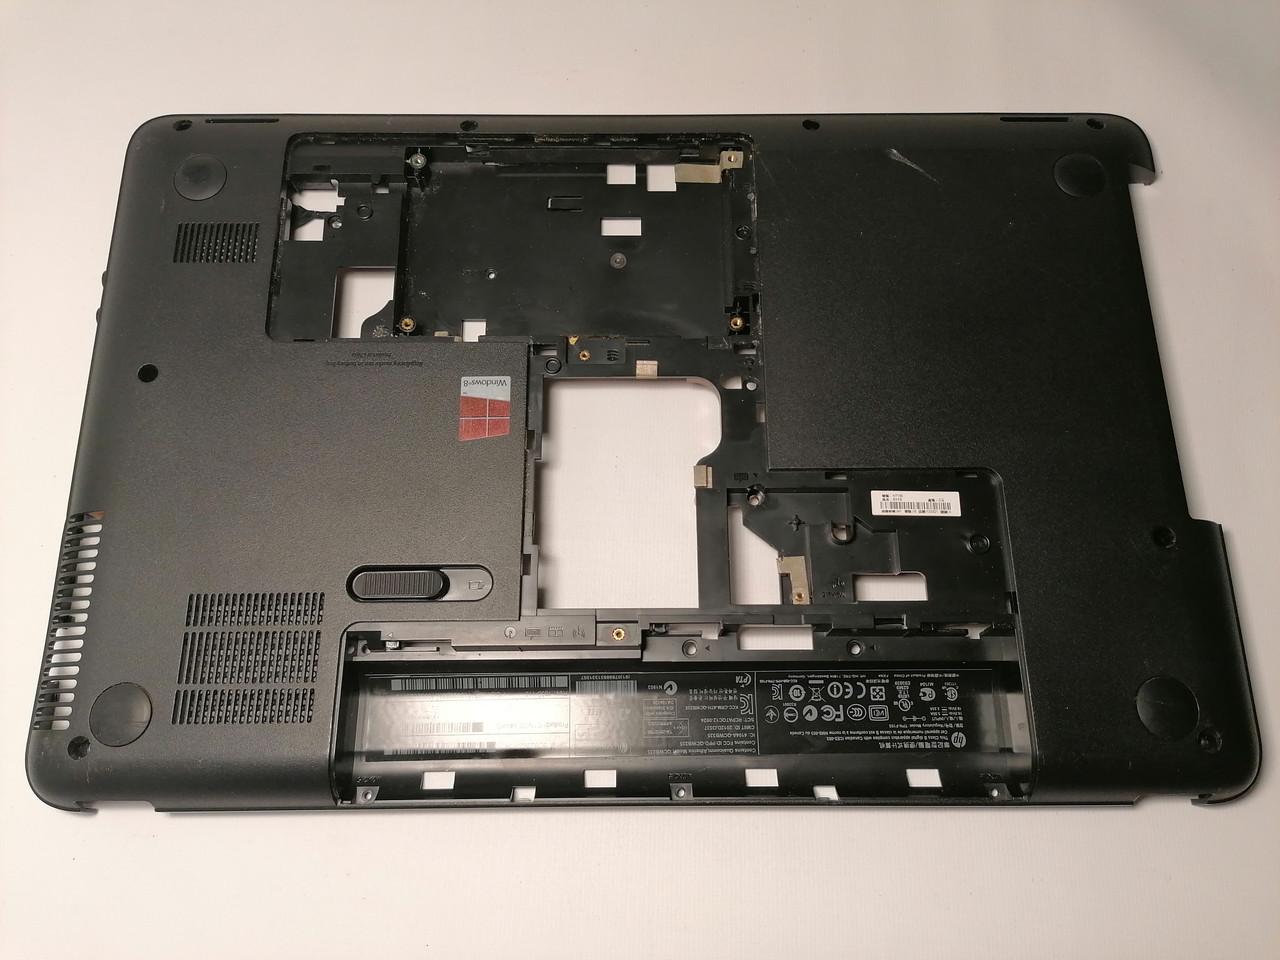 Б/У корпус поддон (низ) для HP 650, 655, Compaq CQ58 (708523-001)